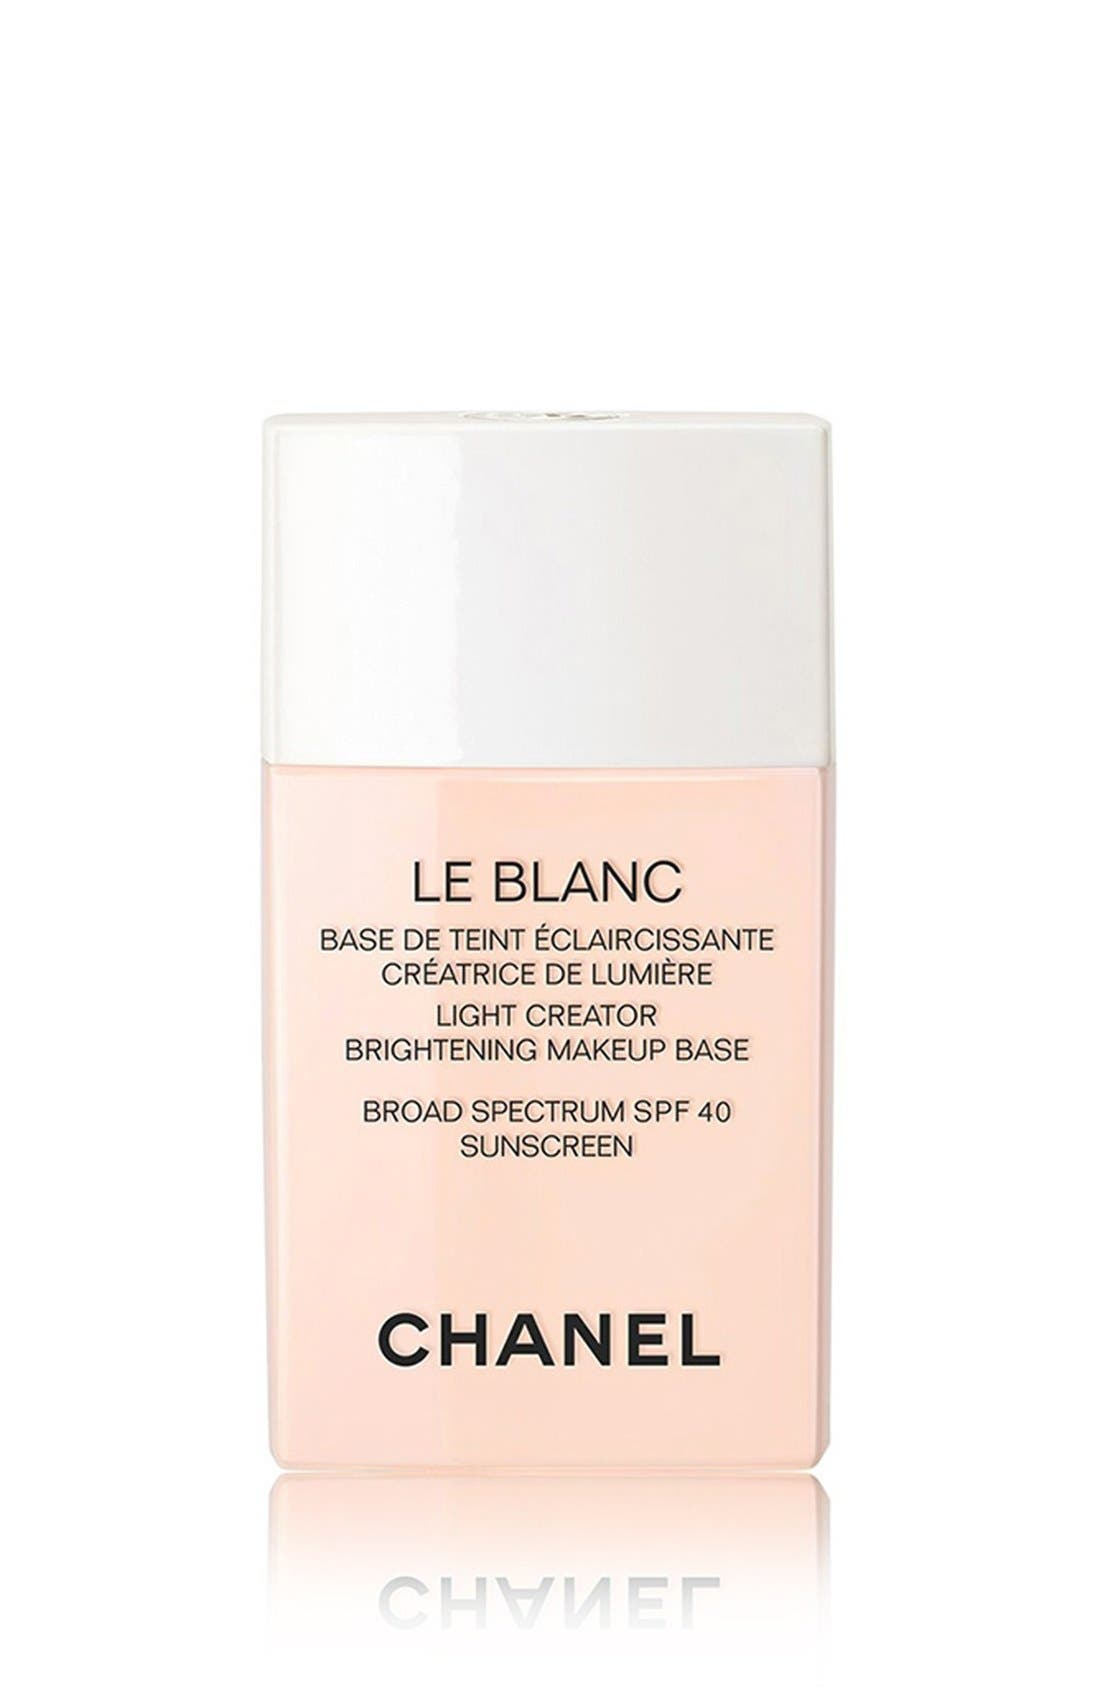 CHANEL LE BLANC LIGHT CREATOR  Brightening Makeup Base Broad Spectrum SPF 40 Sunscreen